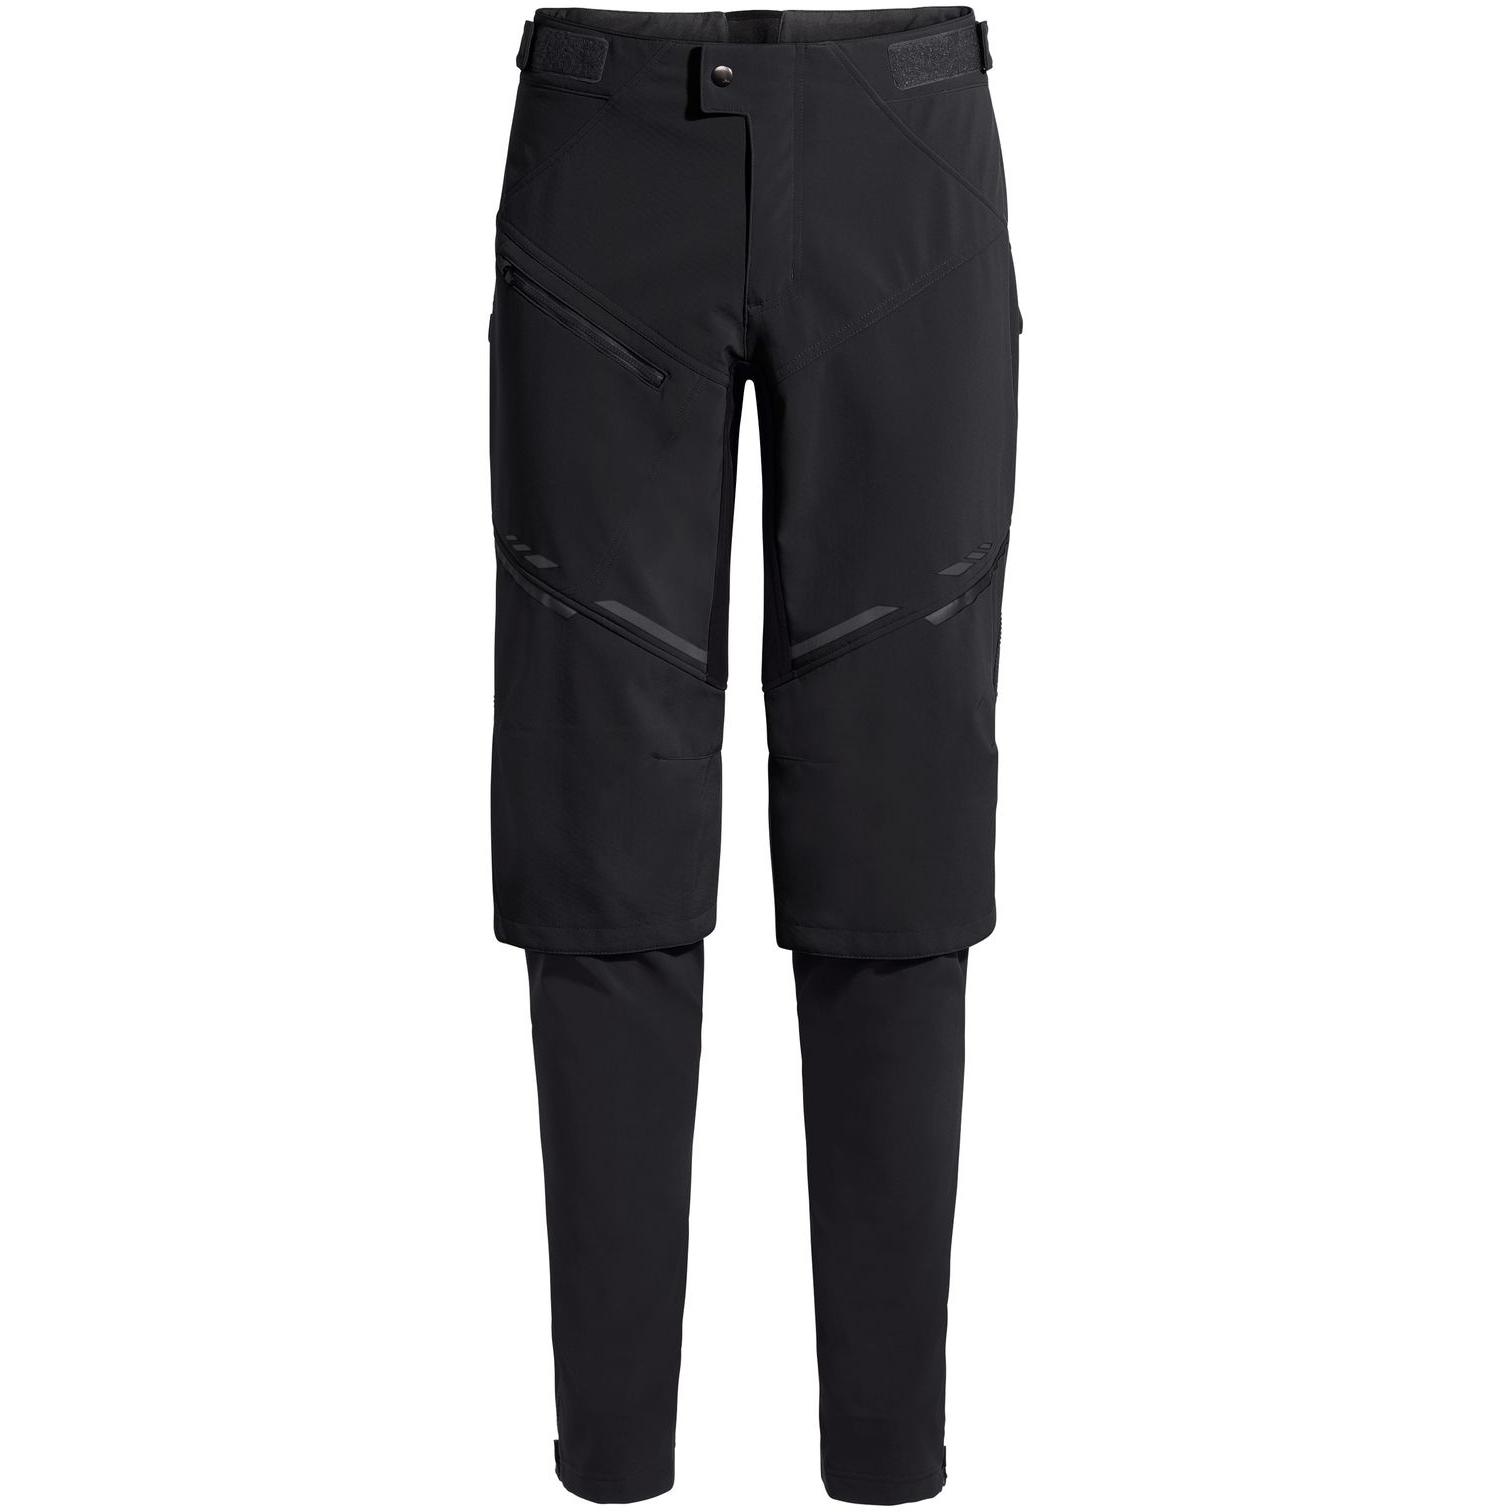 Vaude Virt Pantalones de Softshell II - negro/negro